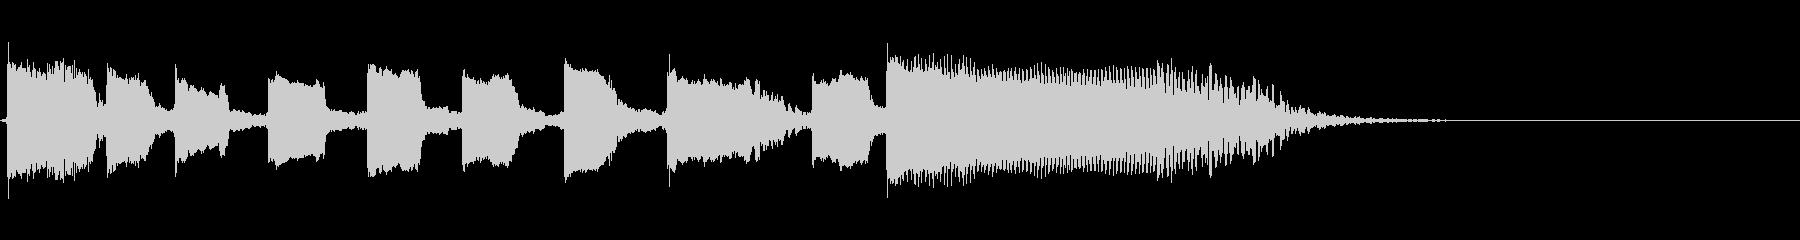 Guitarジングル3/おしゃれソロの未再生の波形